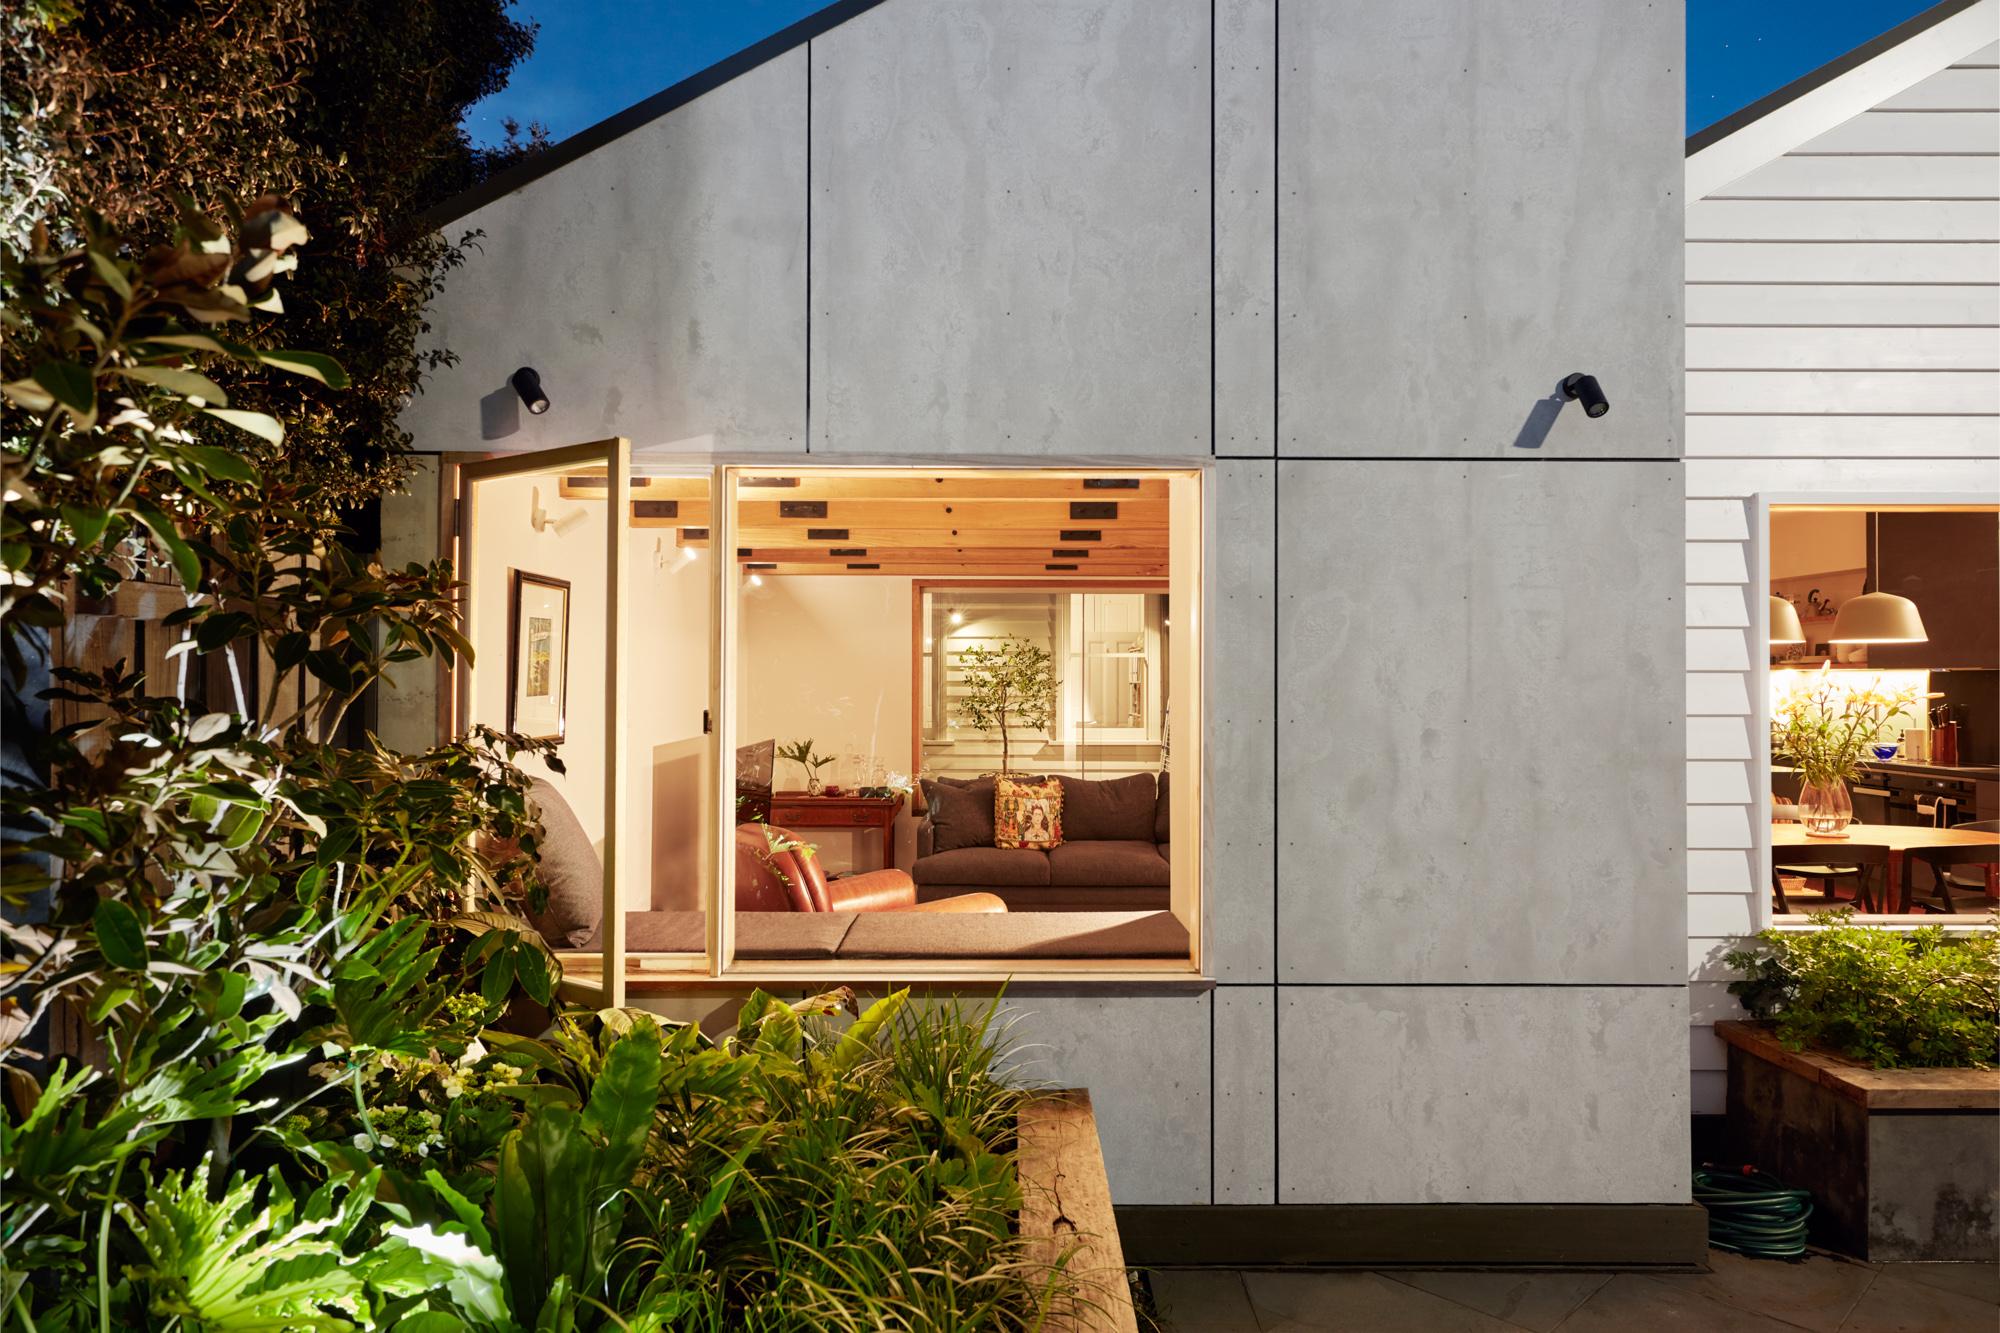 Gallery Of Albert Park House Local Australian Contepmorary Architecture & Interiors Albert Park, Melbourne Image 12